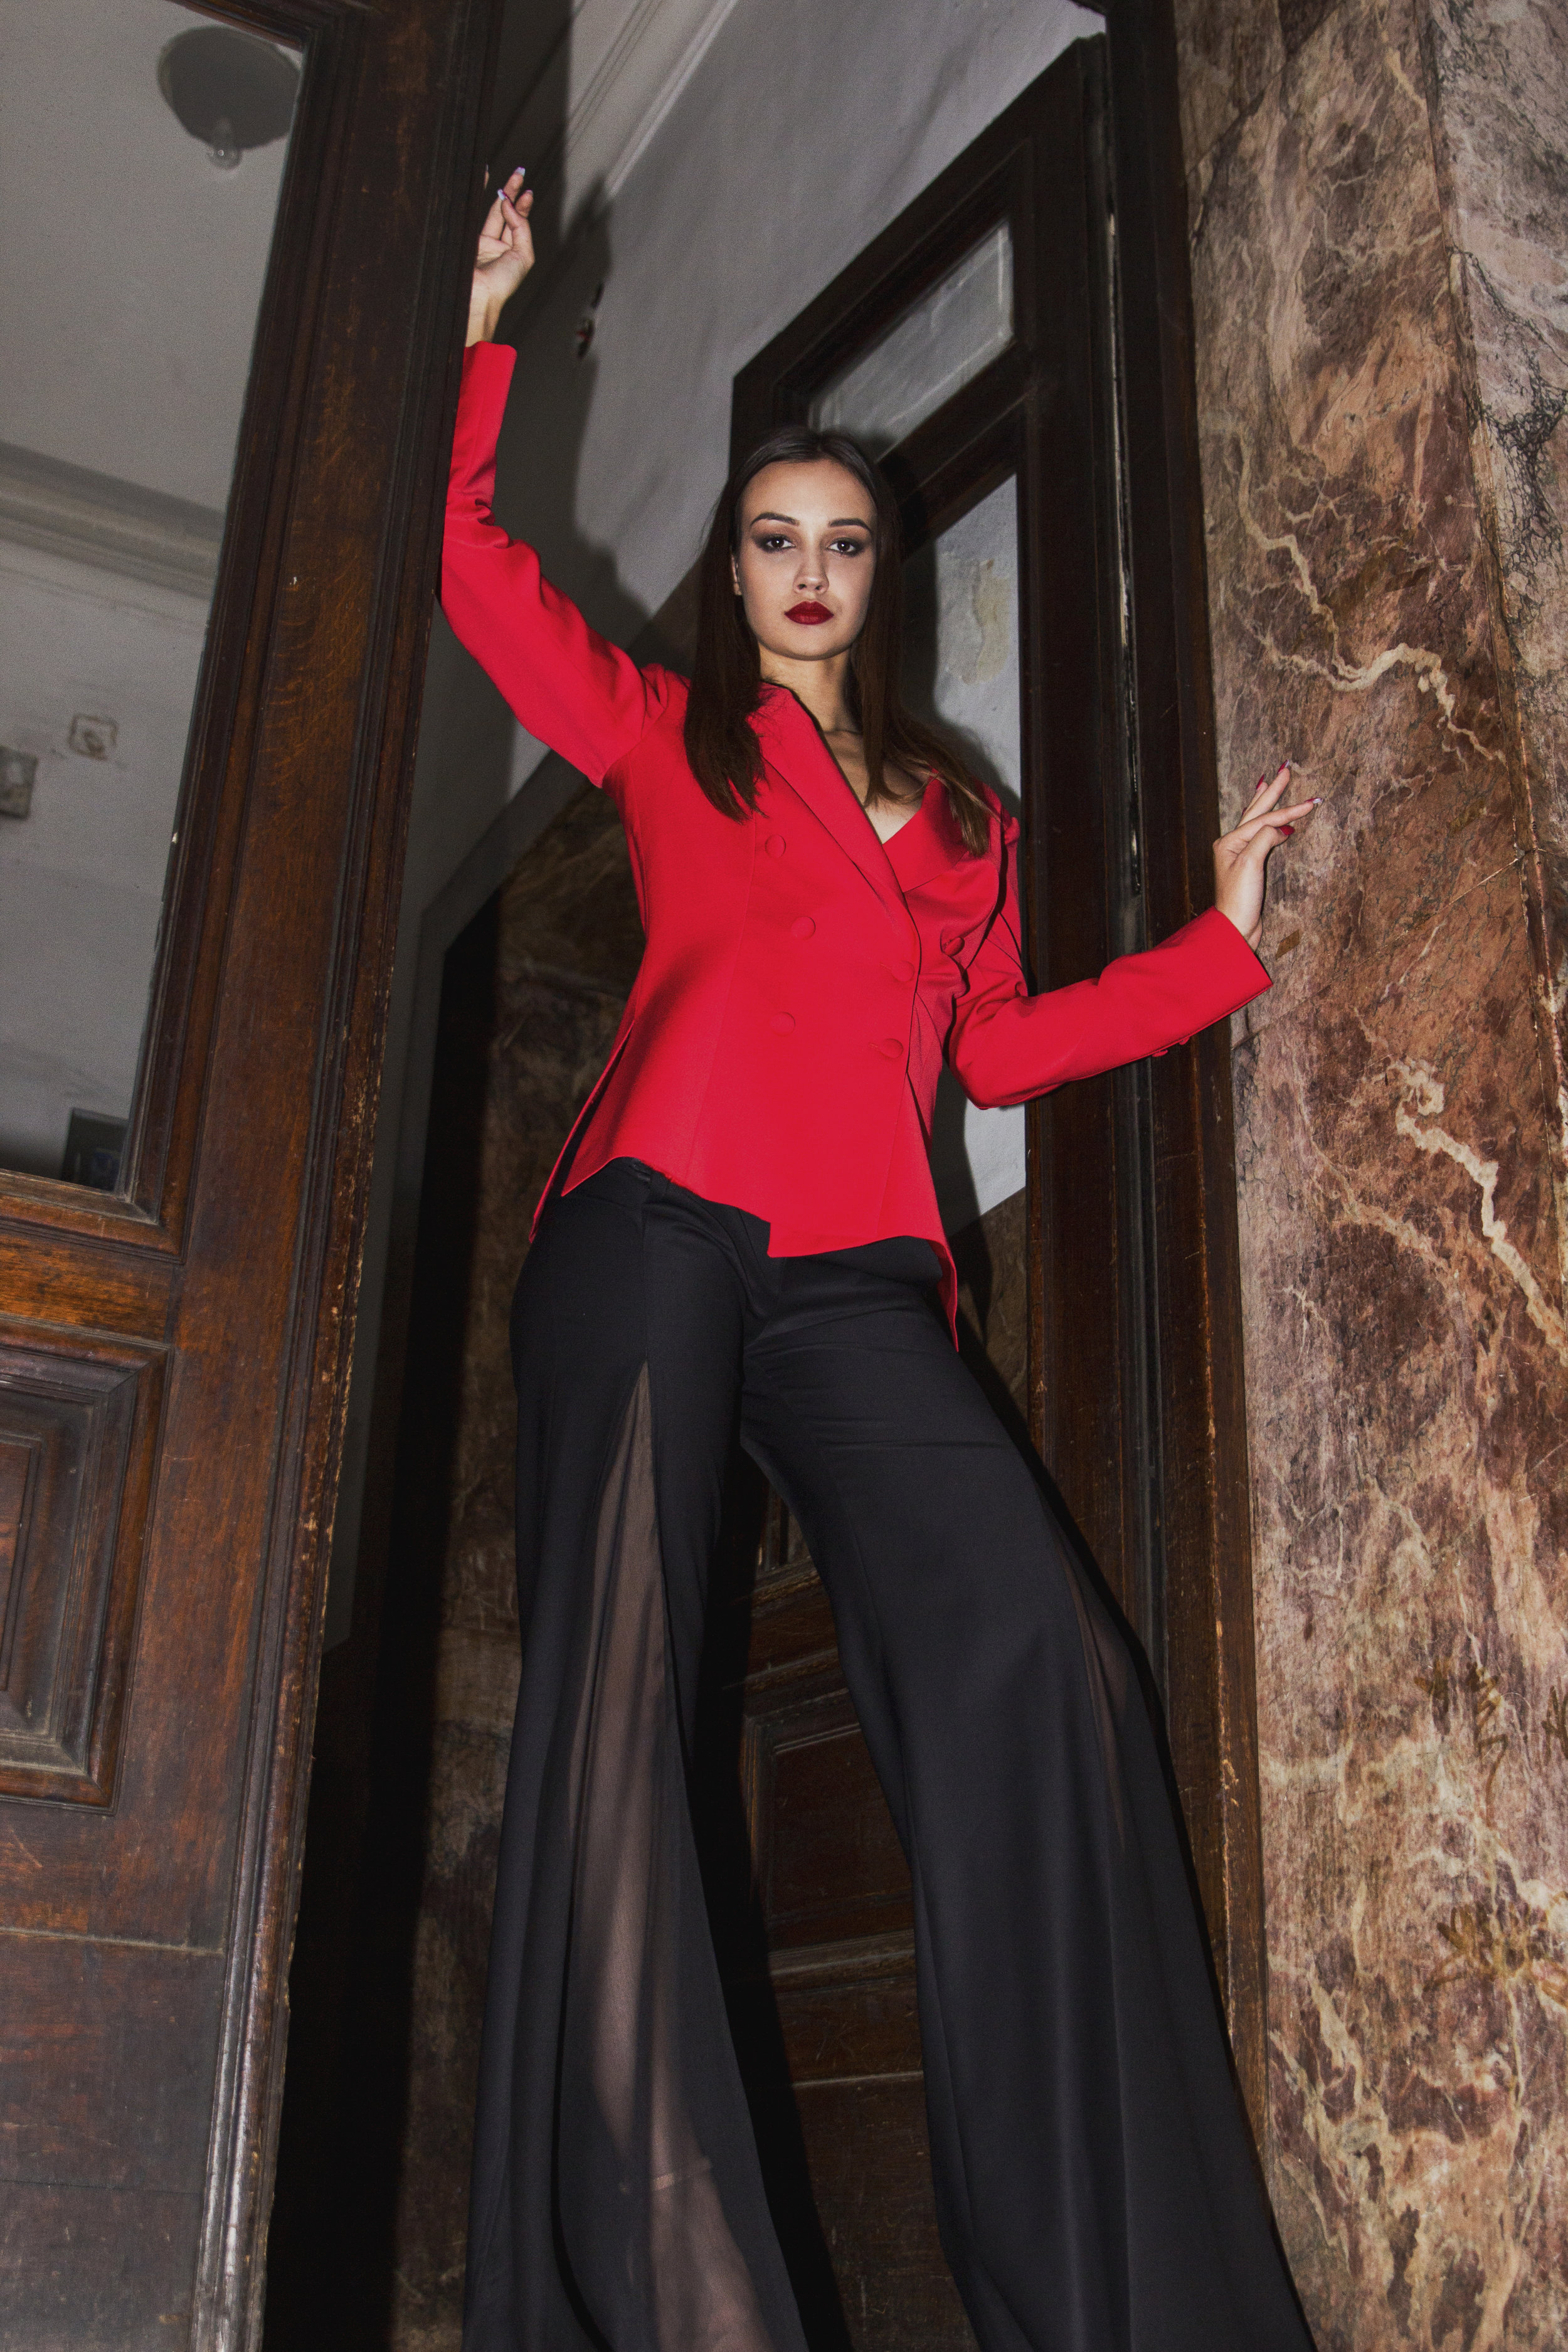 luka-lajic-fashion-photography-zagreb-croatia-mateyaneira-croatian-designer (15).jpg